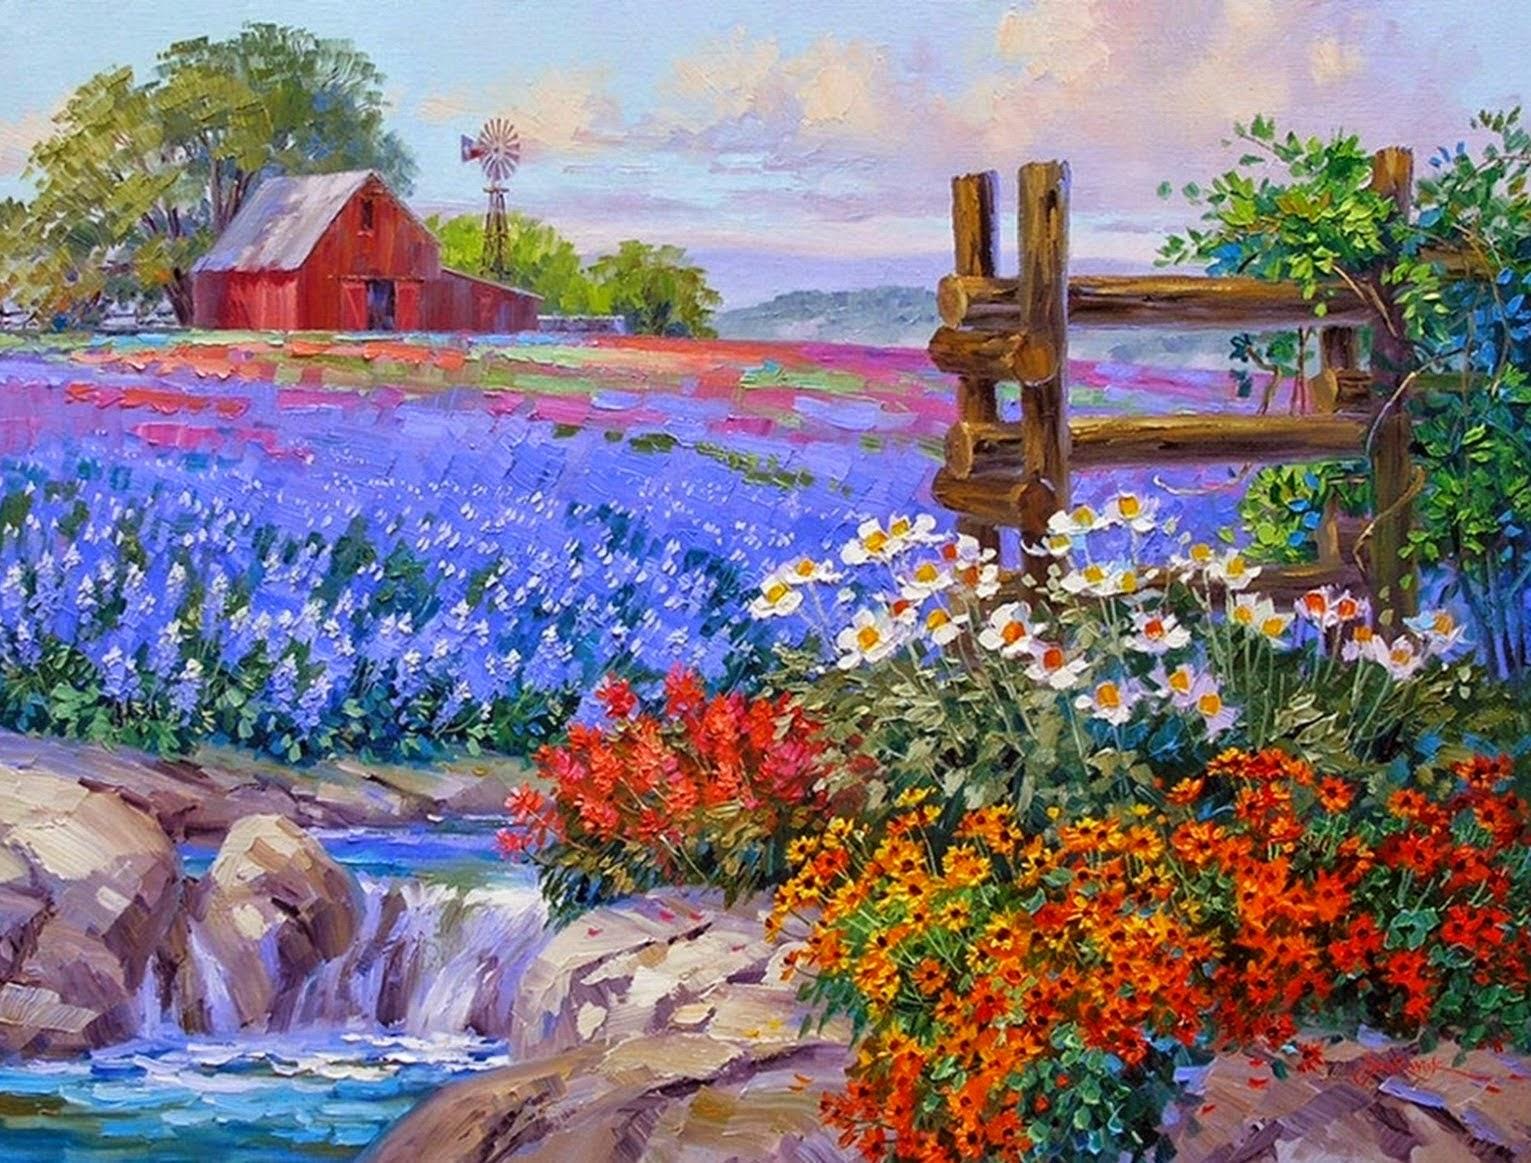 violetas: PINTURAS CON ESPÀTULA